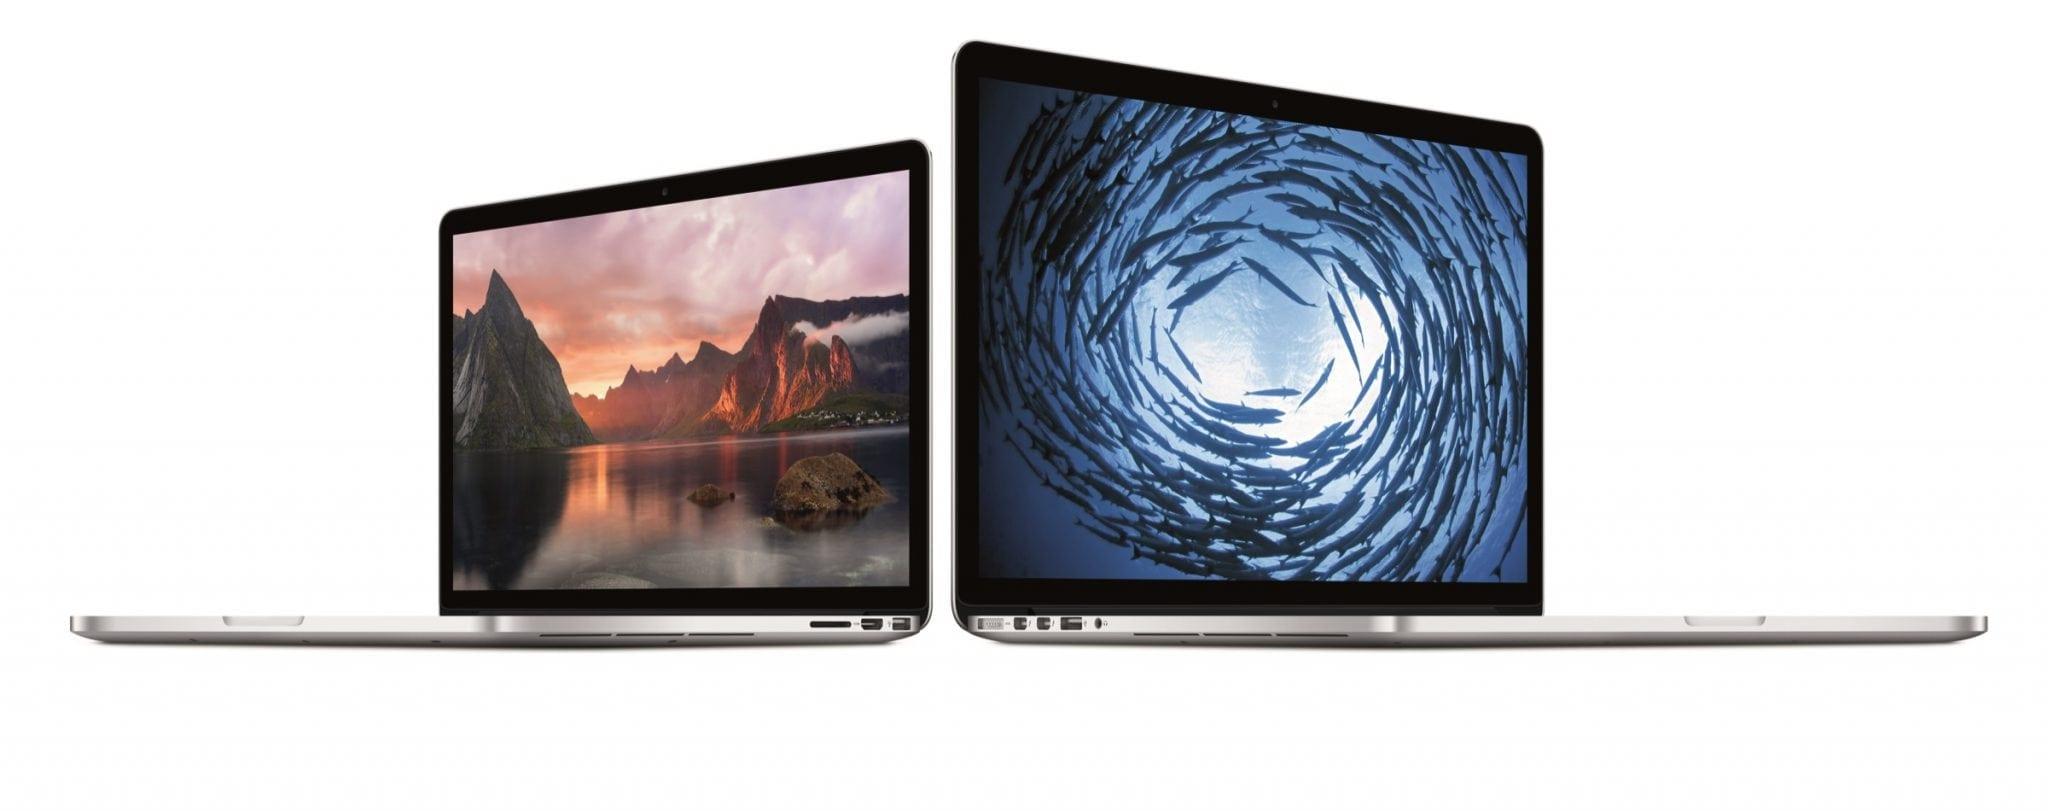 Apple va introduce ecrane OLED și mini-LED pe iPad și MacBook anul viitor